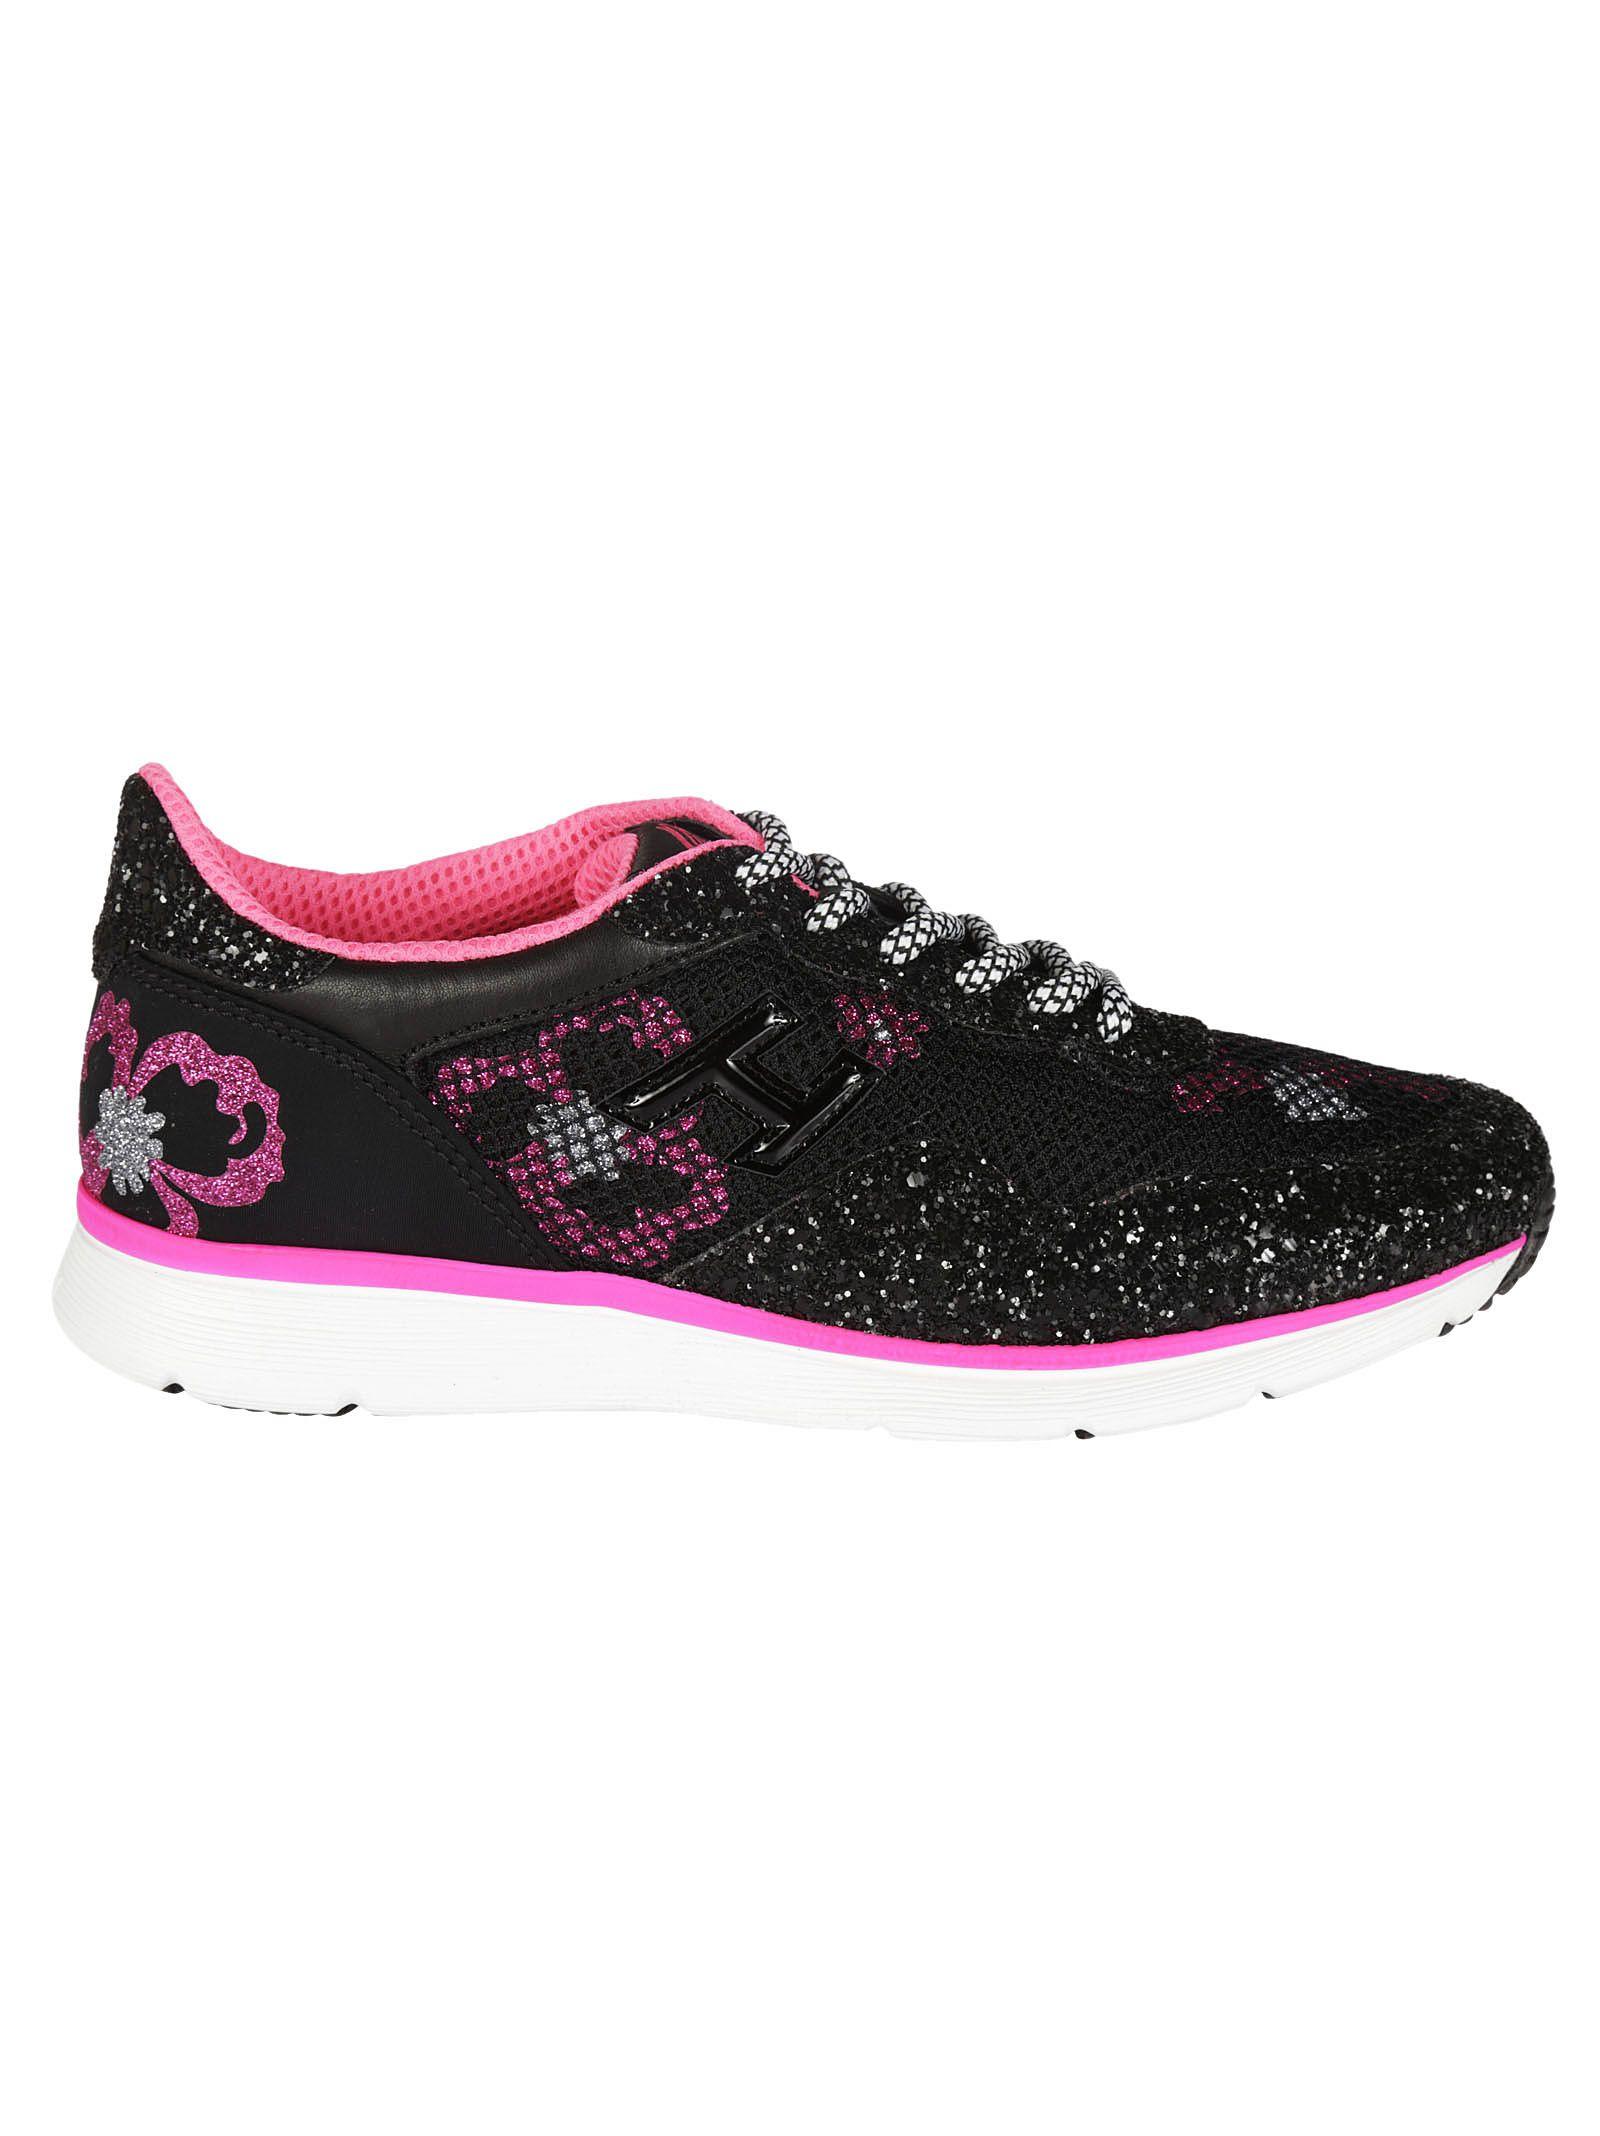 floral glitter-effect sneakers - Black Hogan AzfnyPT